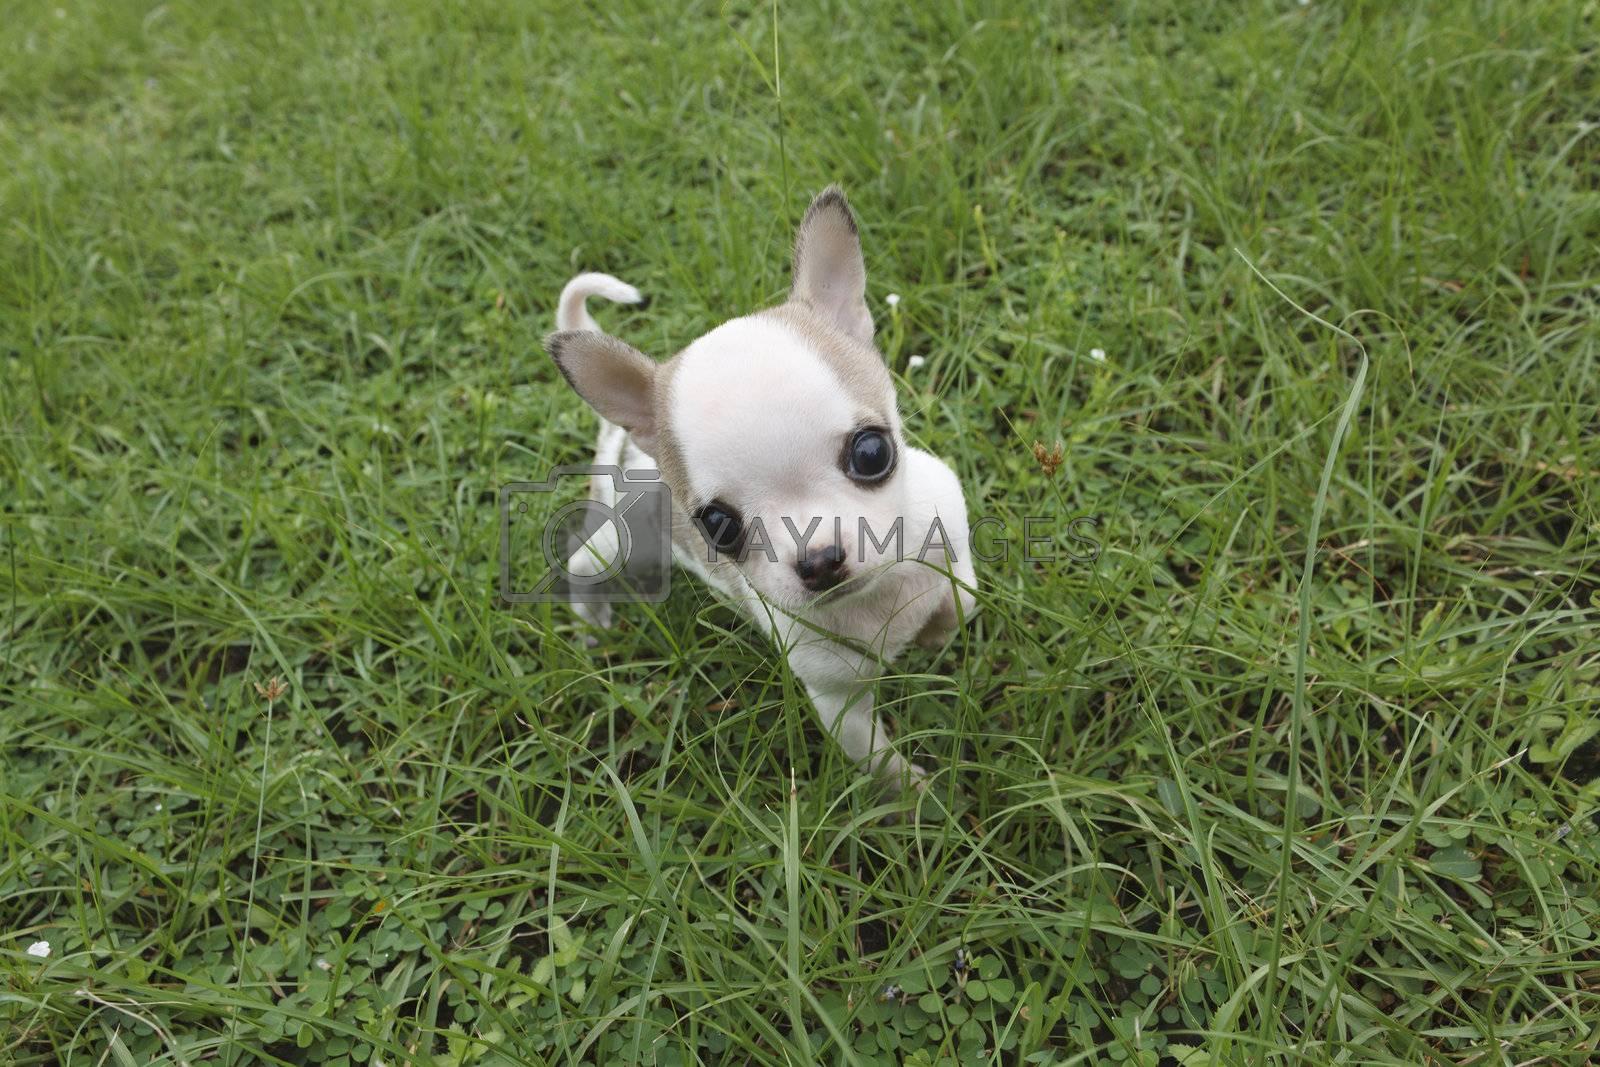 Puppy chihuahua walking at the grass